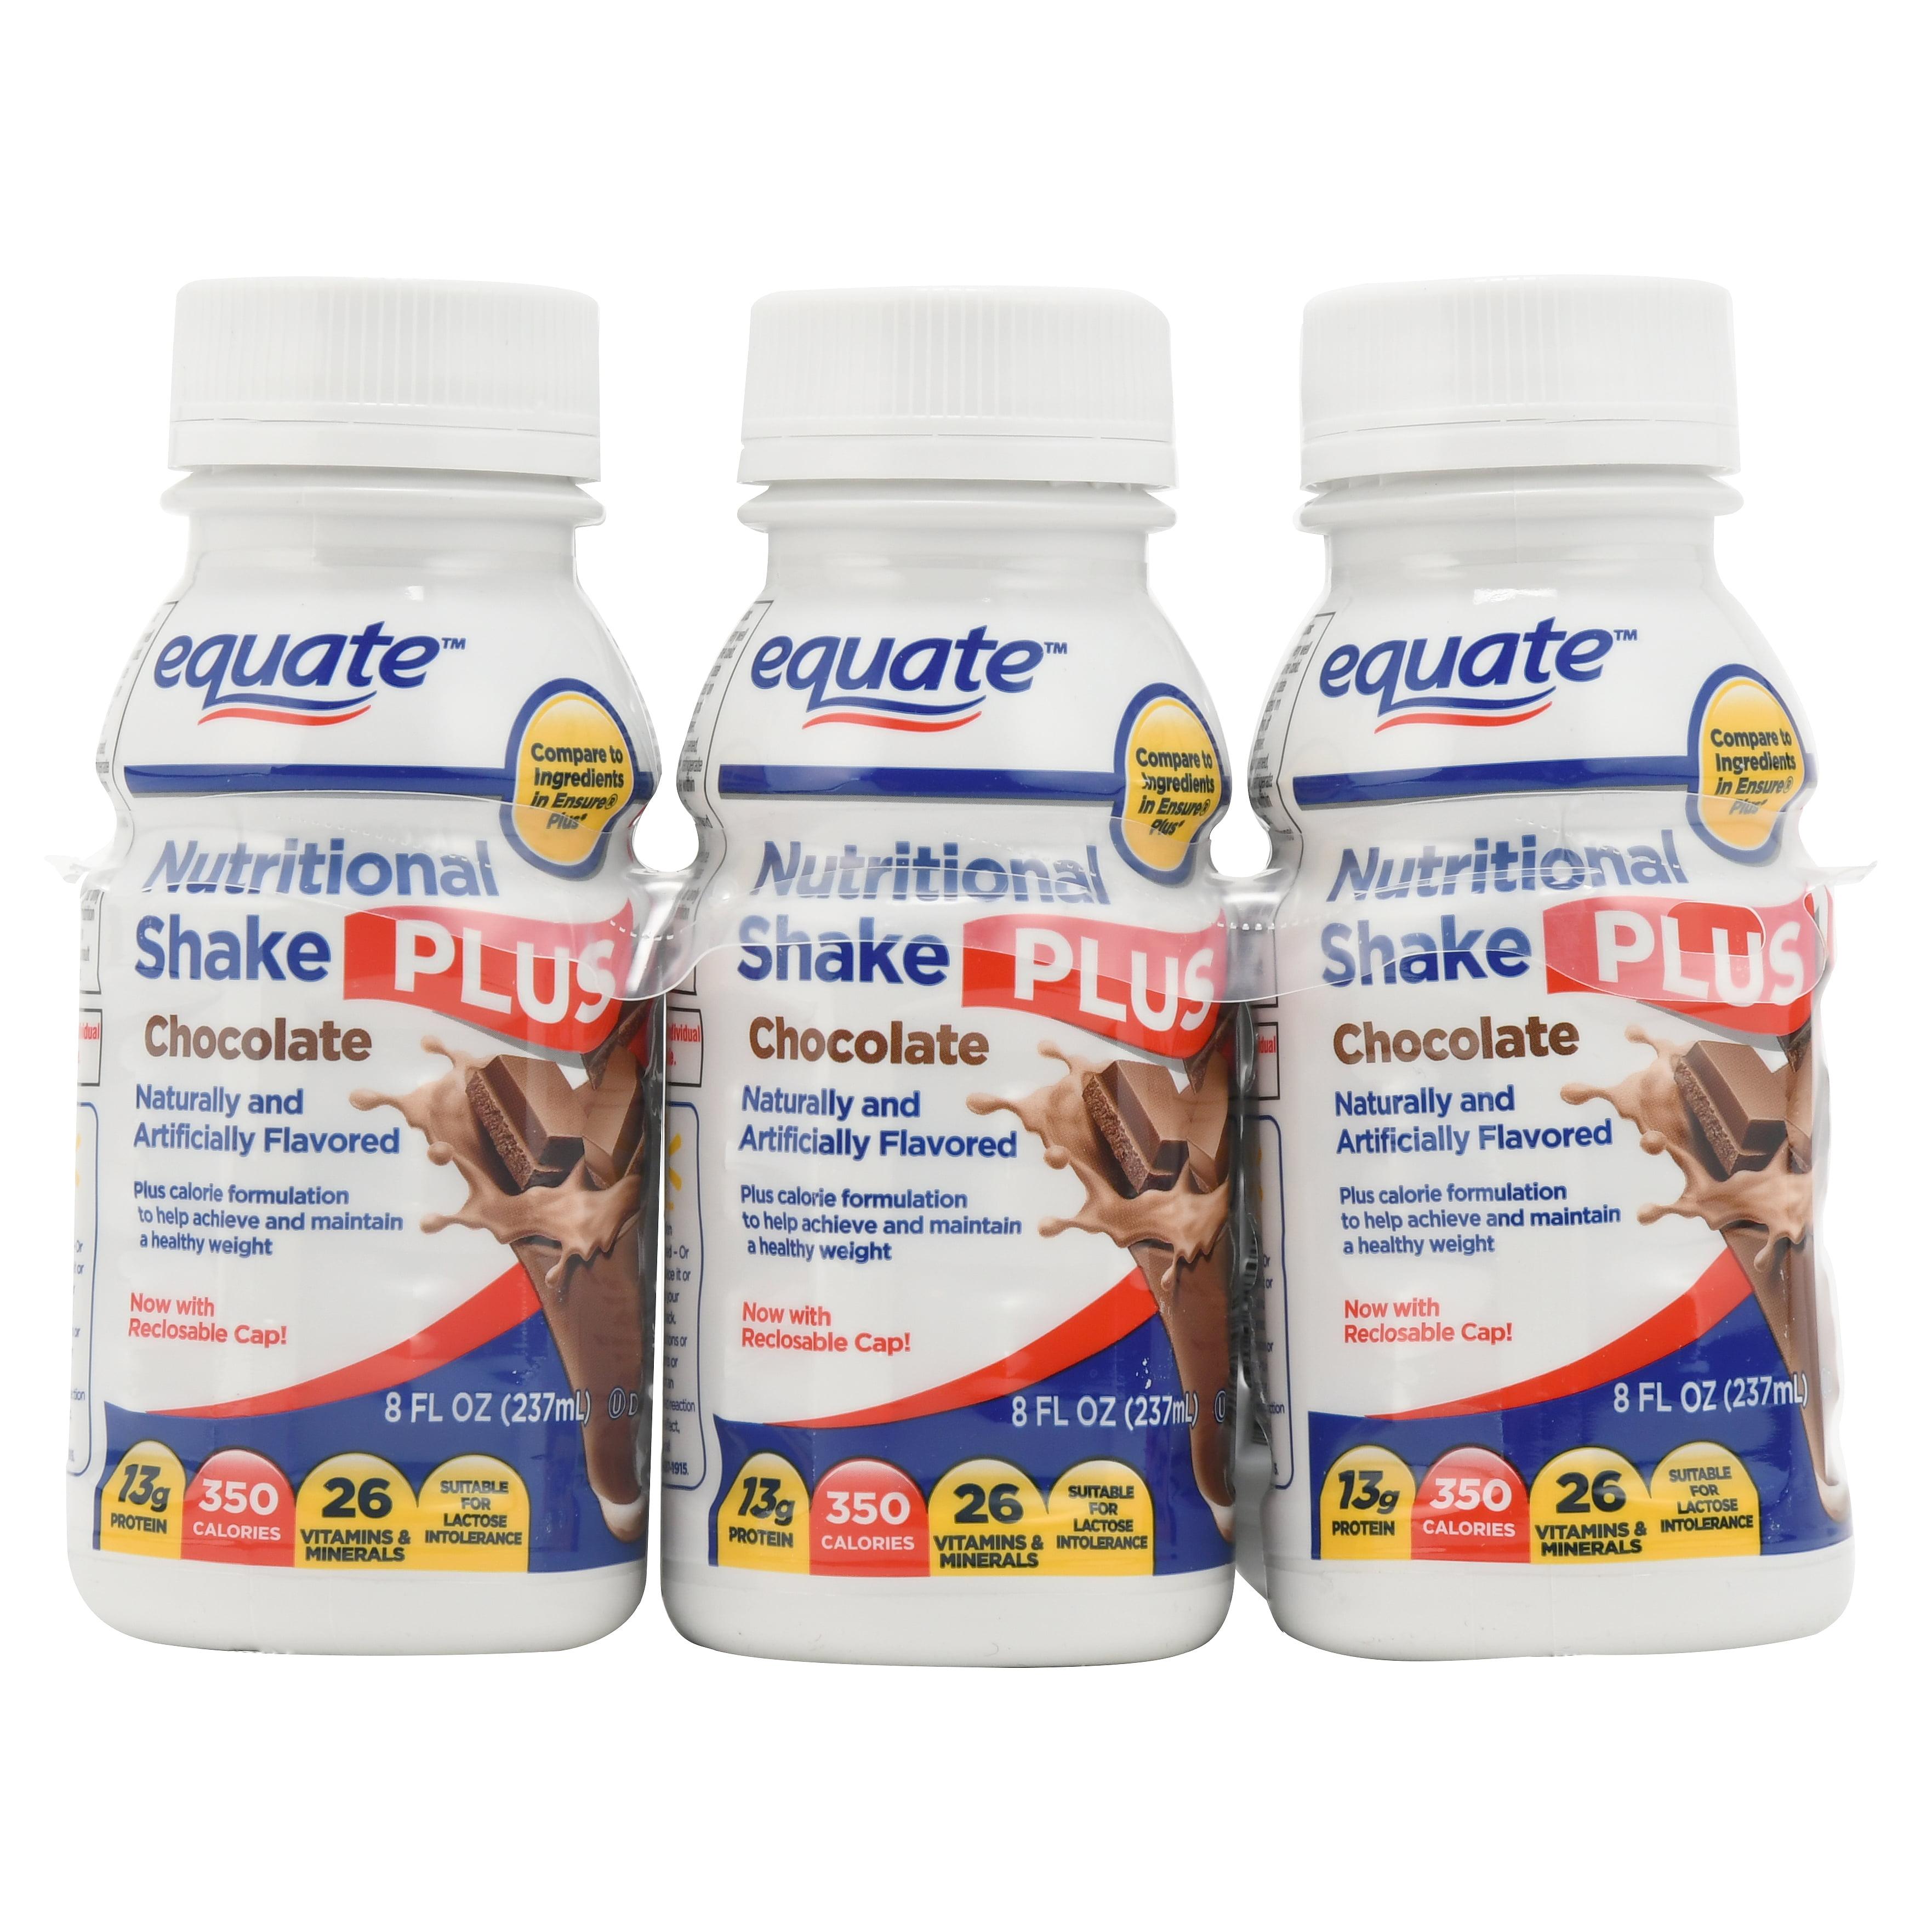 Equate Nutritional Shake Plus, Chocolate, 8 oz, 6 Ct